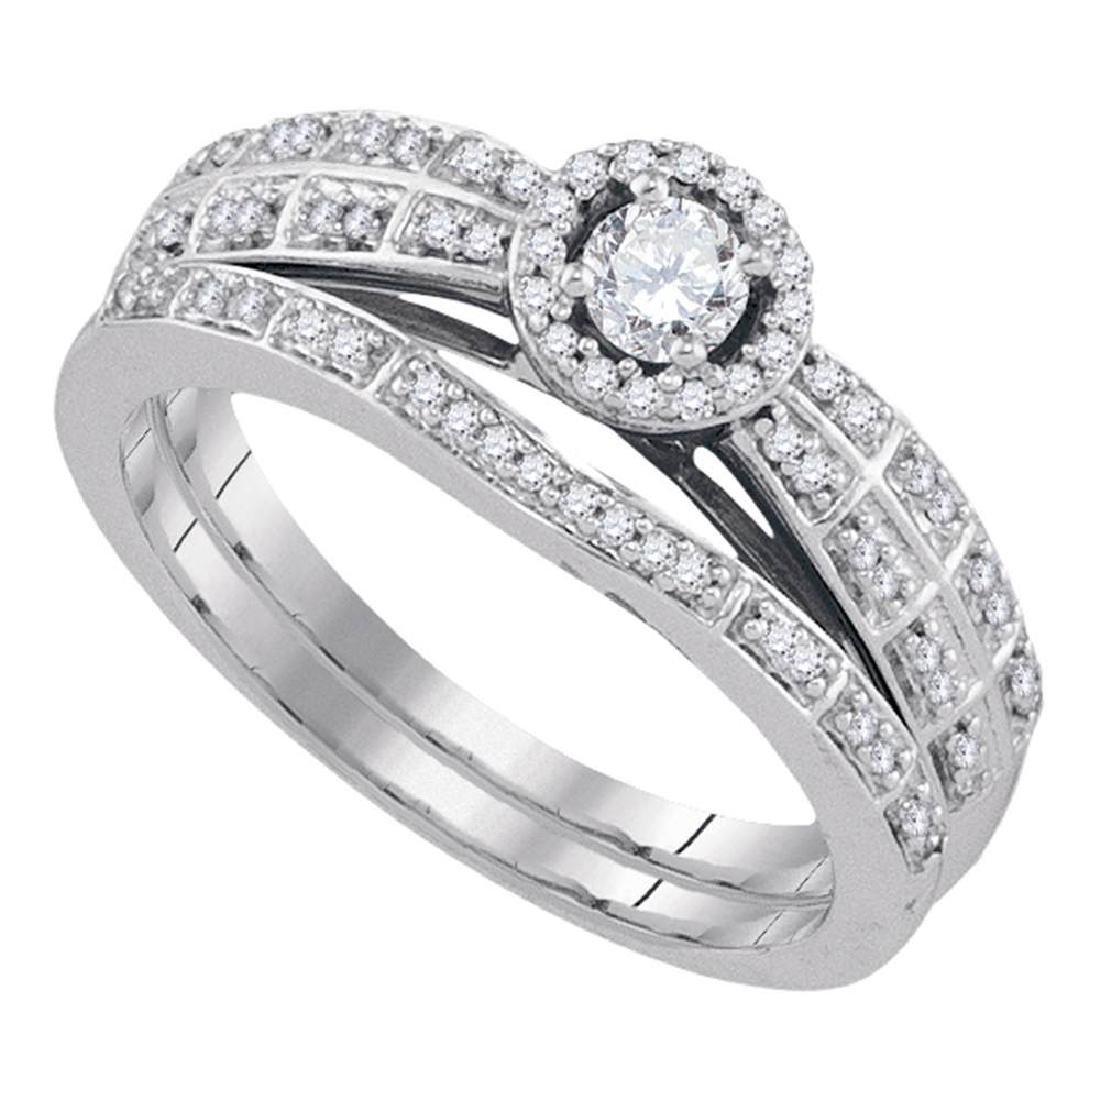 10k White Gold Round Diamond Halo Bridal Wedding Engage